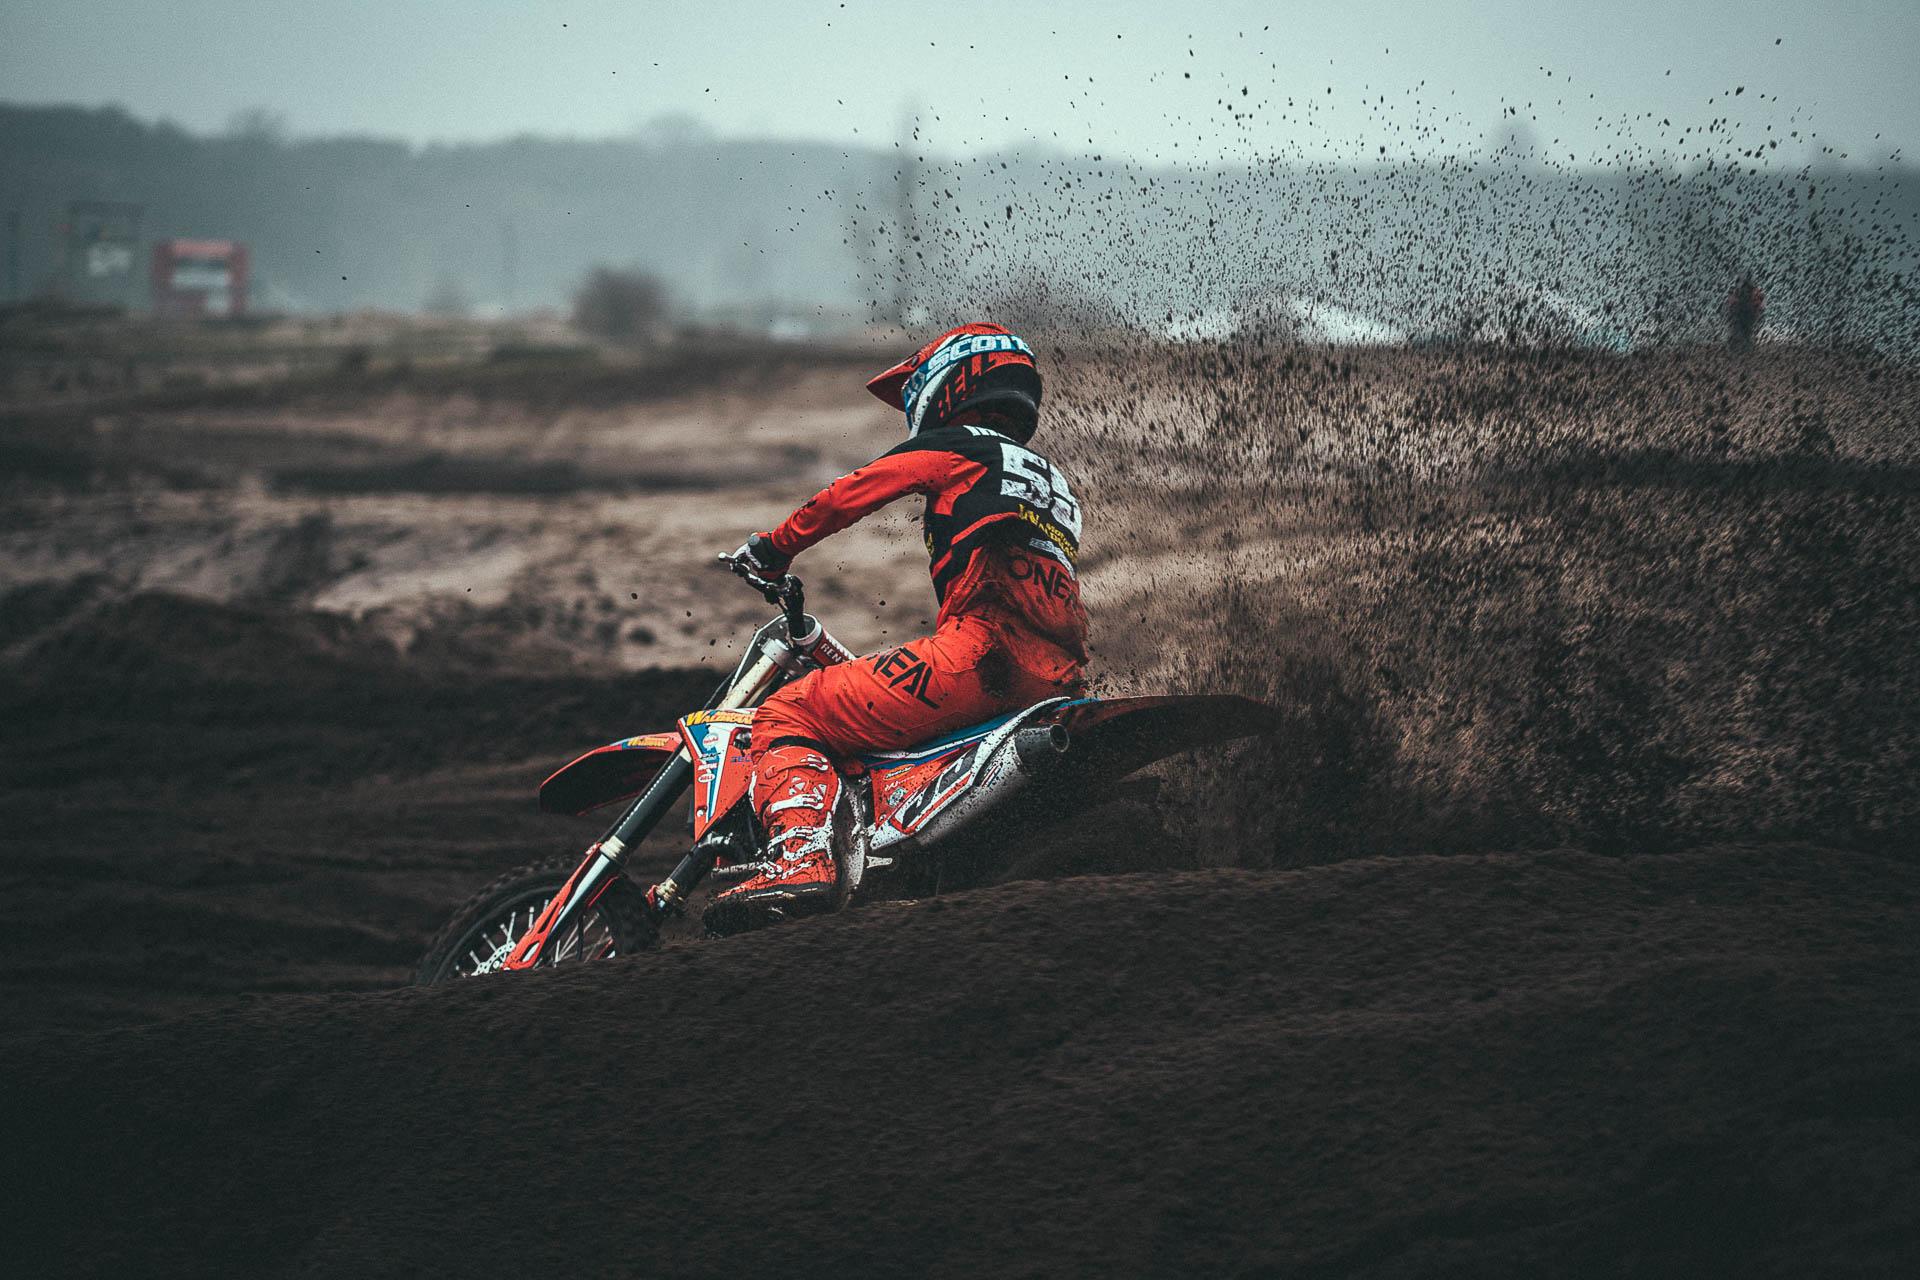 Kim Irmgartz Motocross-Bike